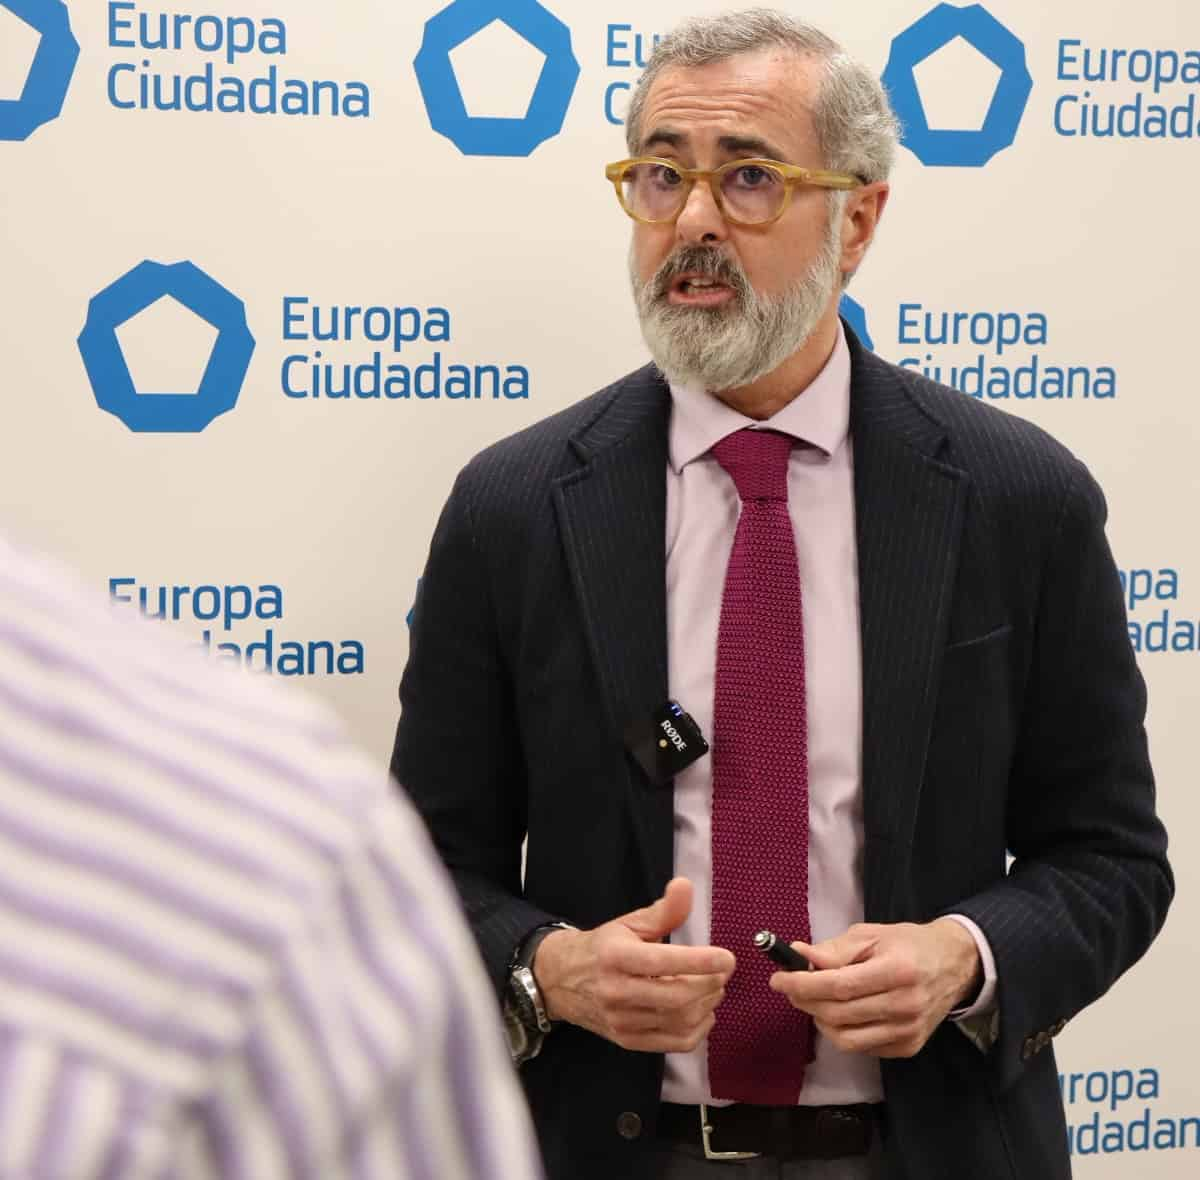 jose carlos montejano presidente europa ciudadana